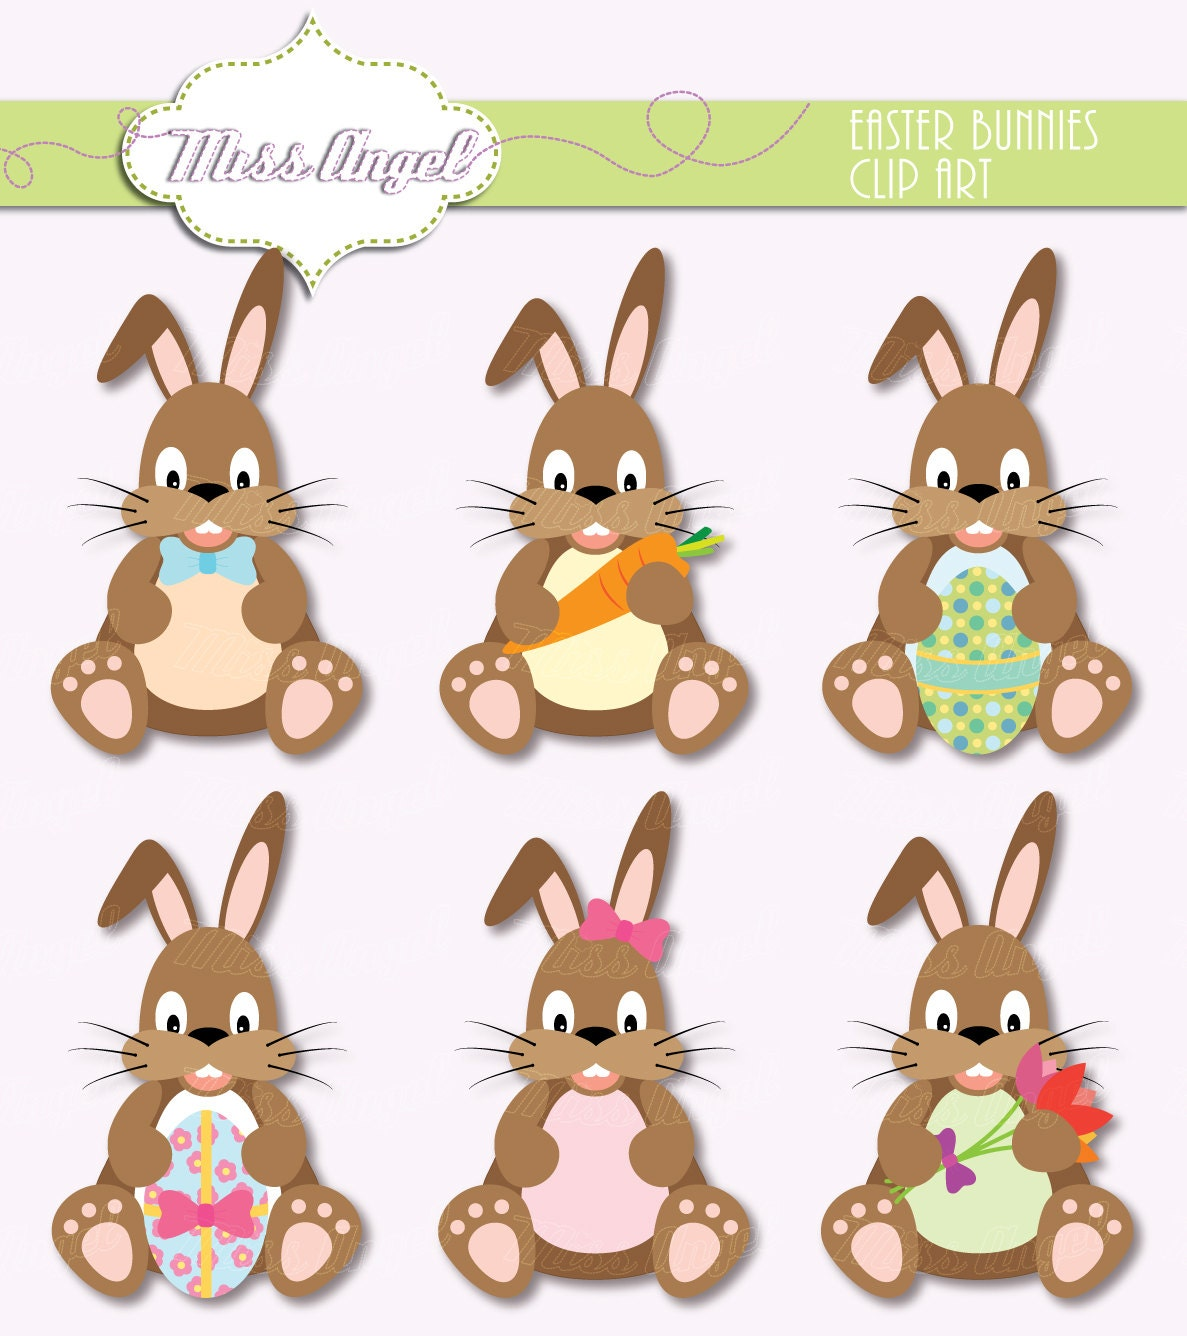 easter bunnies clip art 6 easter bunny 6 brown rabbit